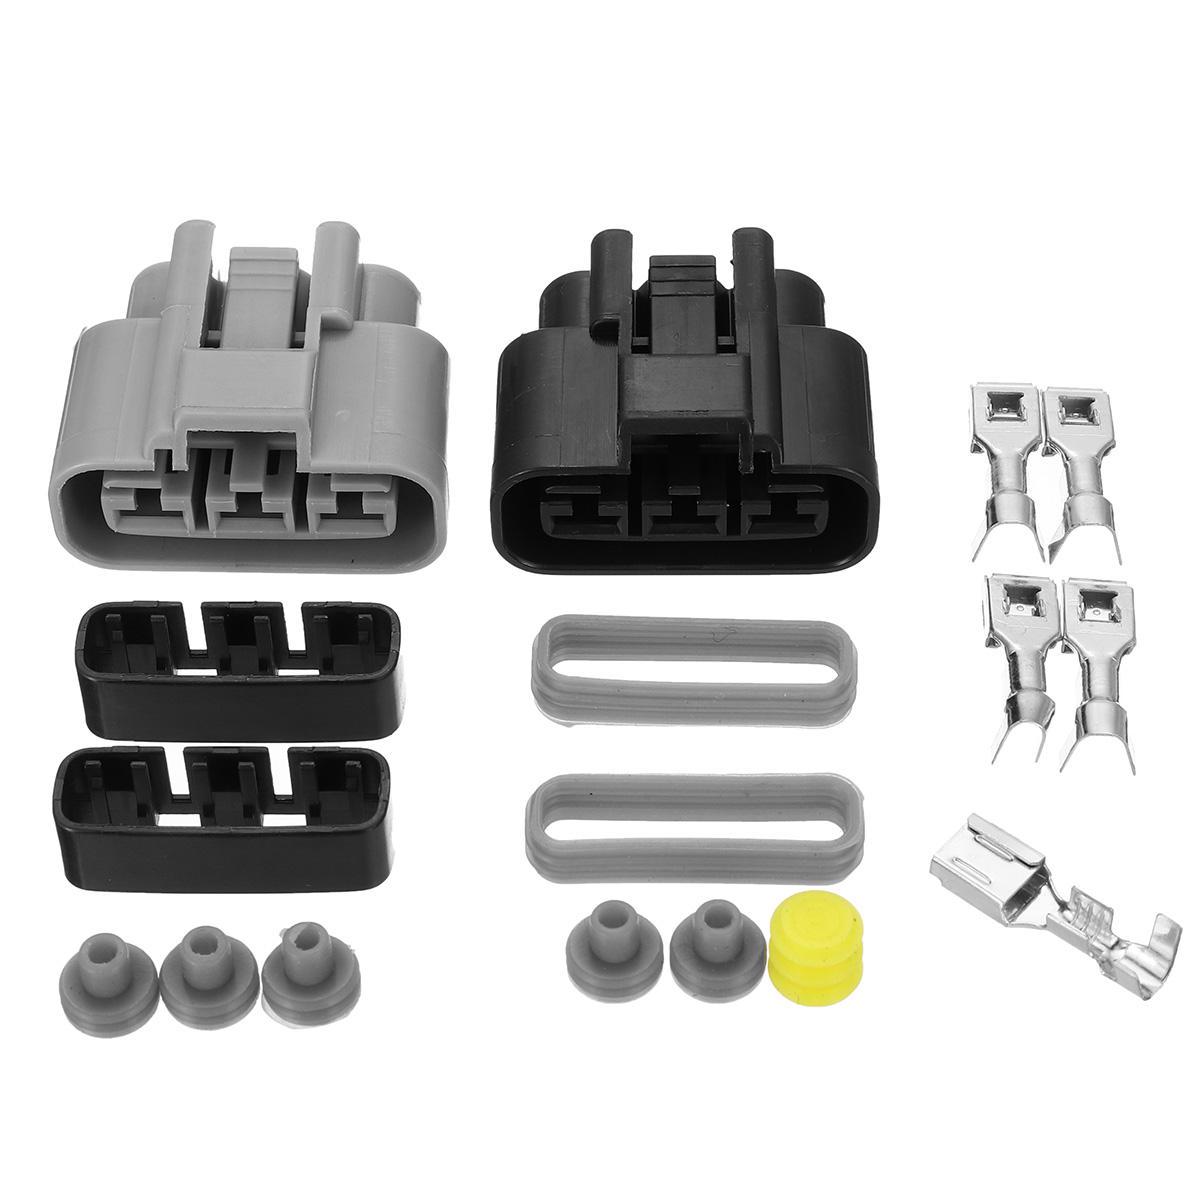 यूनिवर्सल वोल्टेज रेगुलेटर रेक्टीफायर कनेक्टर किट 710000261 Honda / बीएमडब्लू / 1 9 6 9 00/Yamaha के लिए